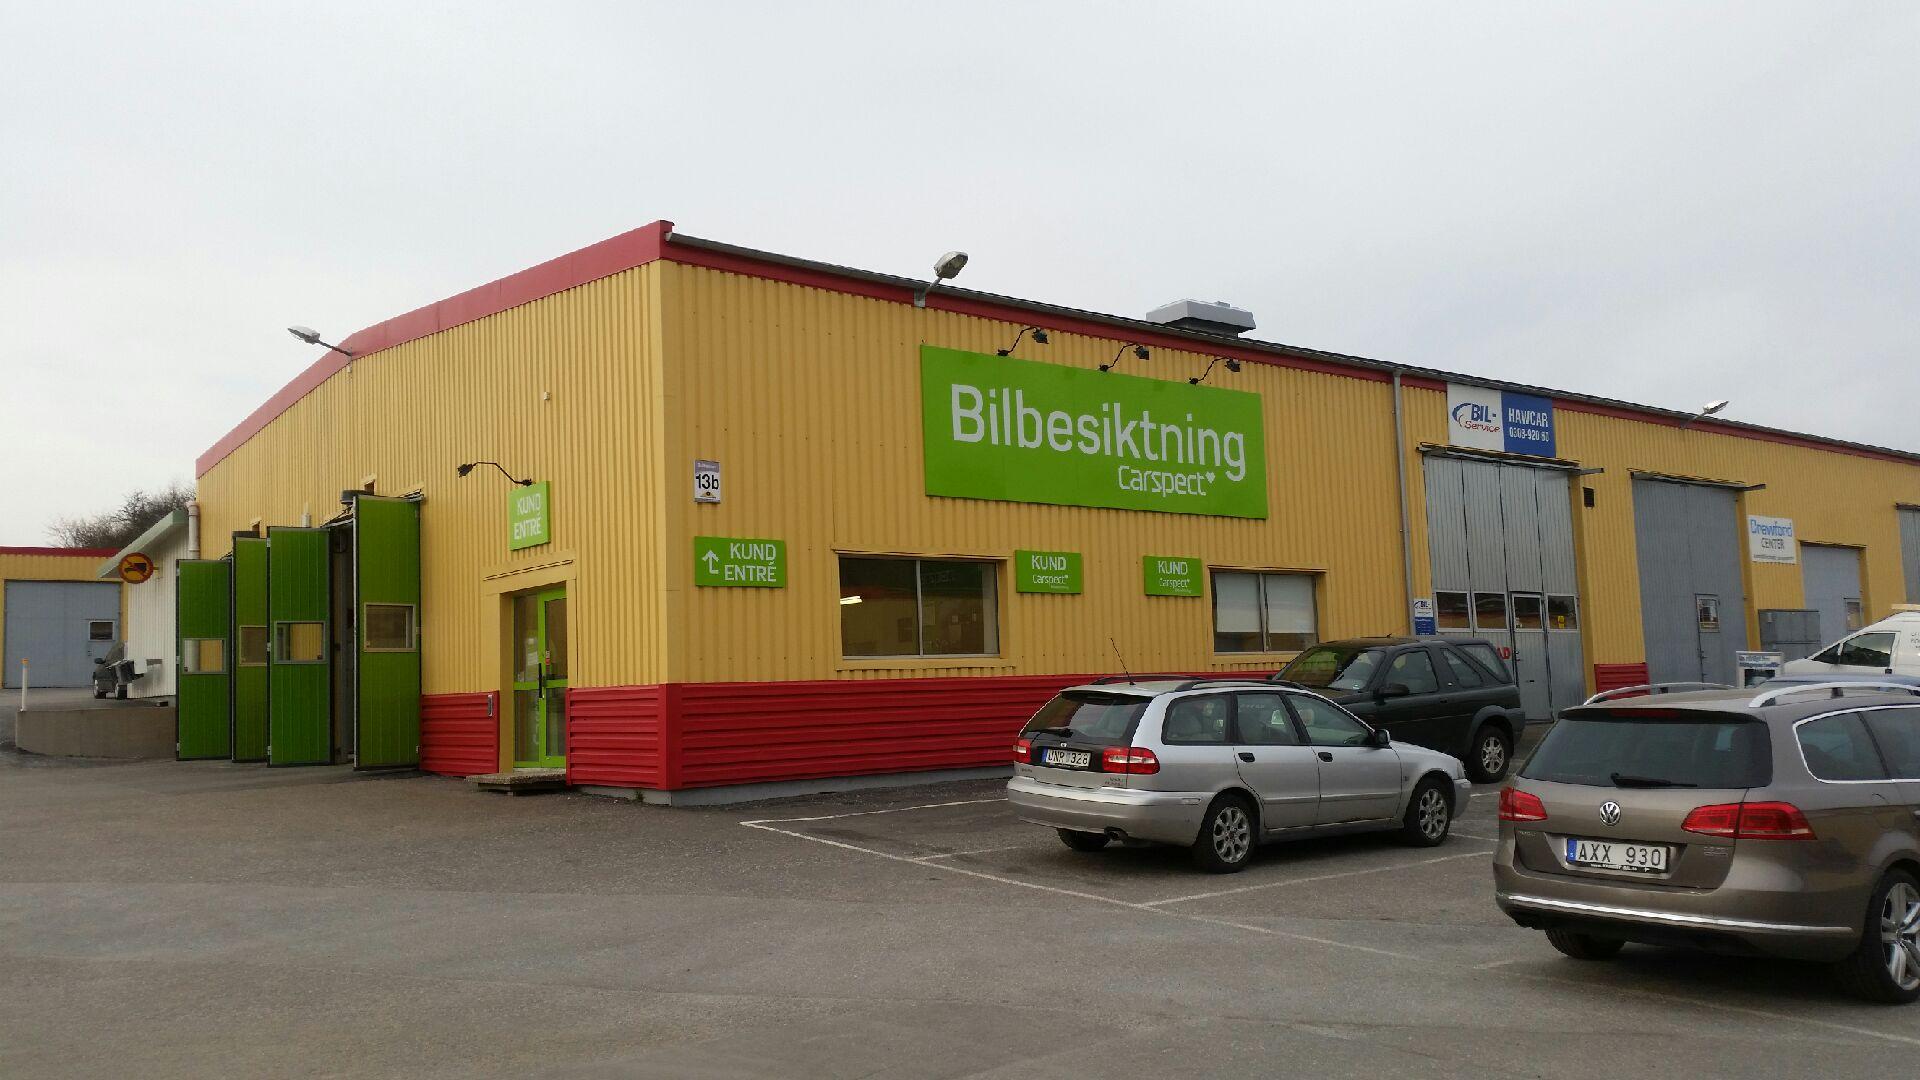 Carspects besiktningsstation i Kungälv